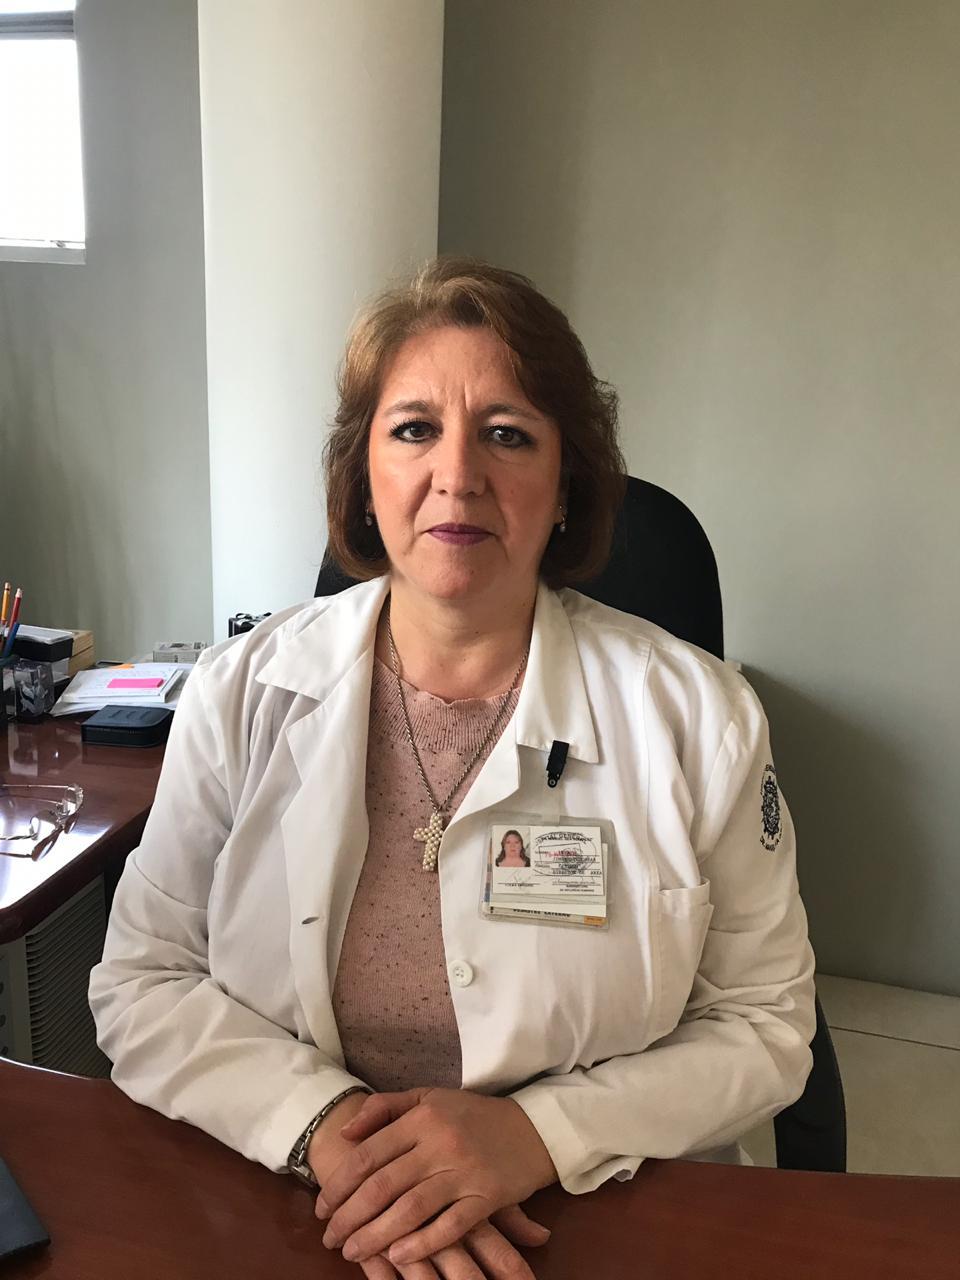 Dra. Irma Jiménez Escobar, Directora Médica